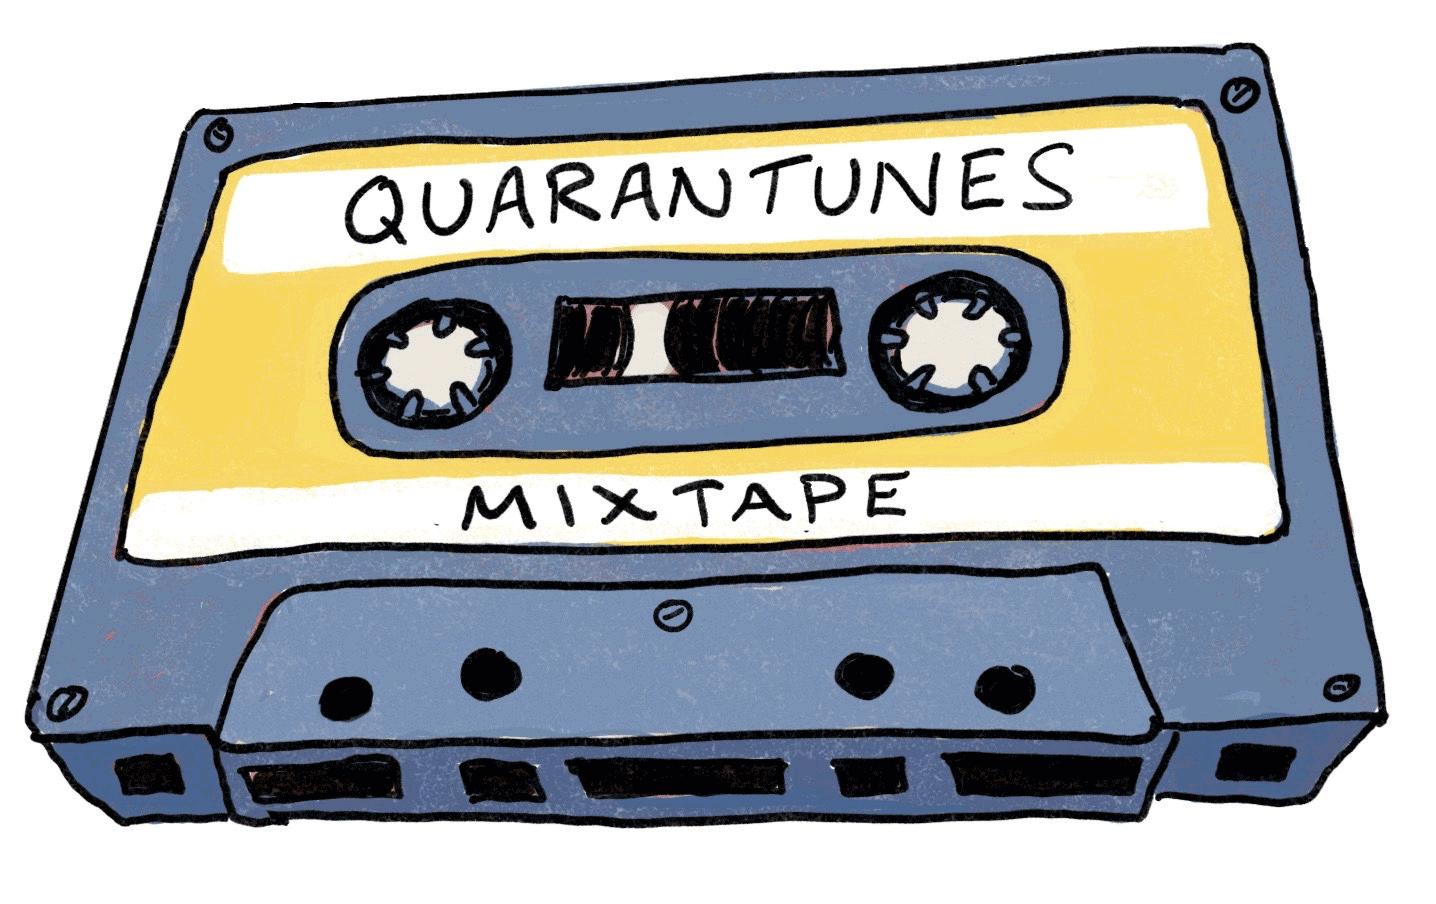 Illustration of a cassette tape.